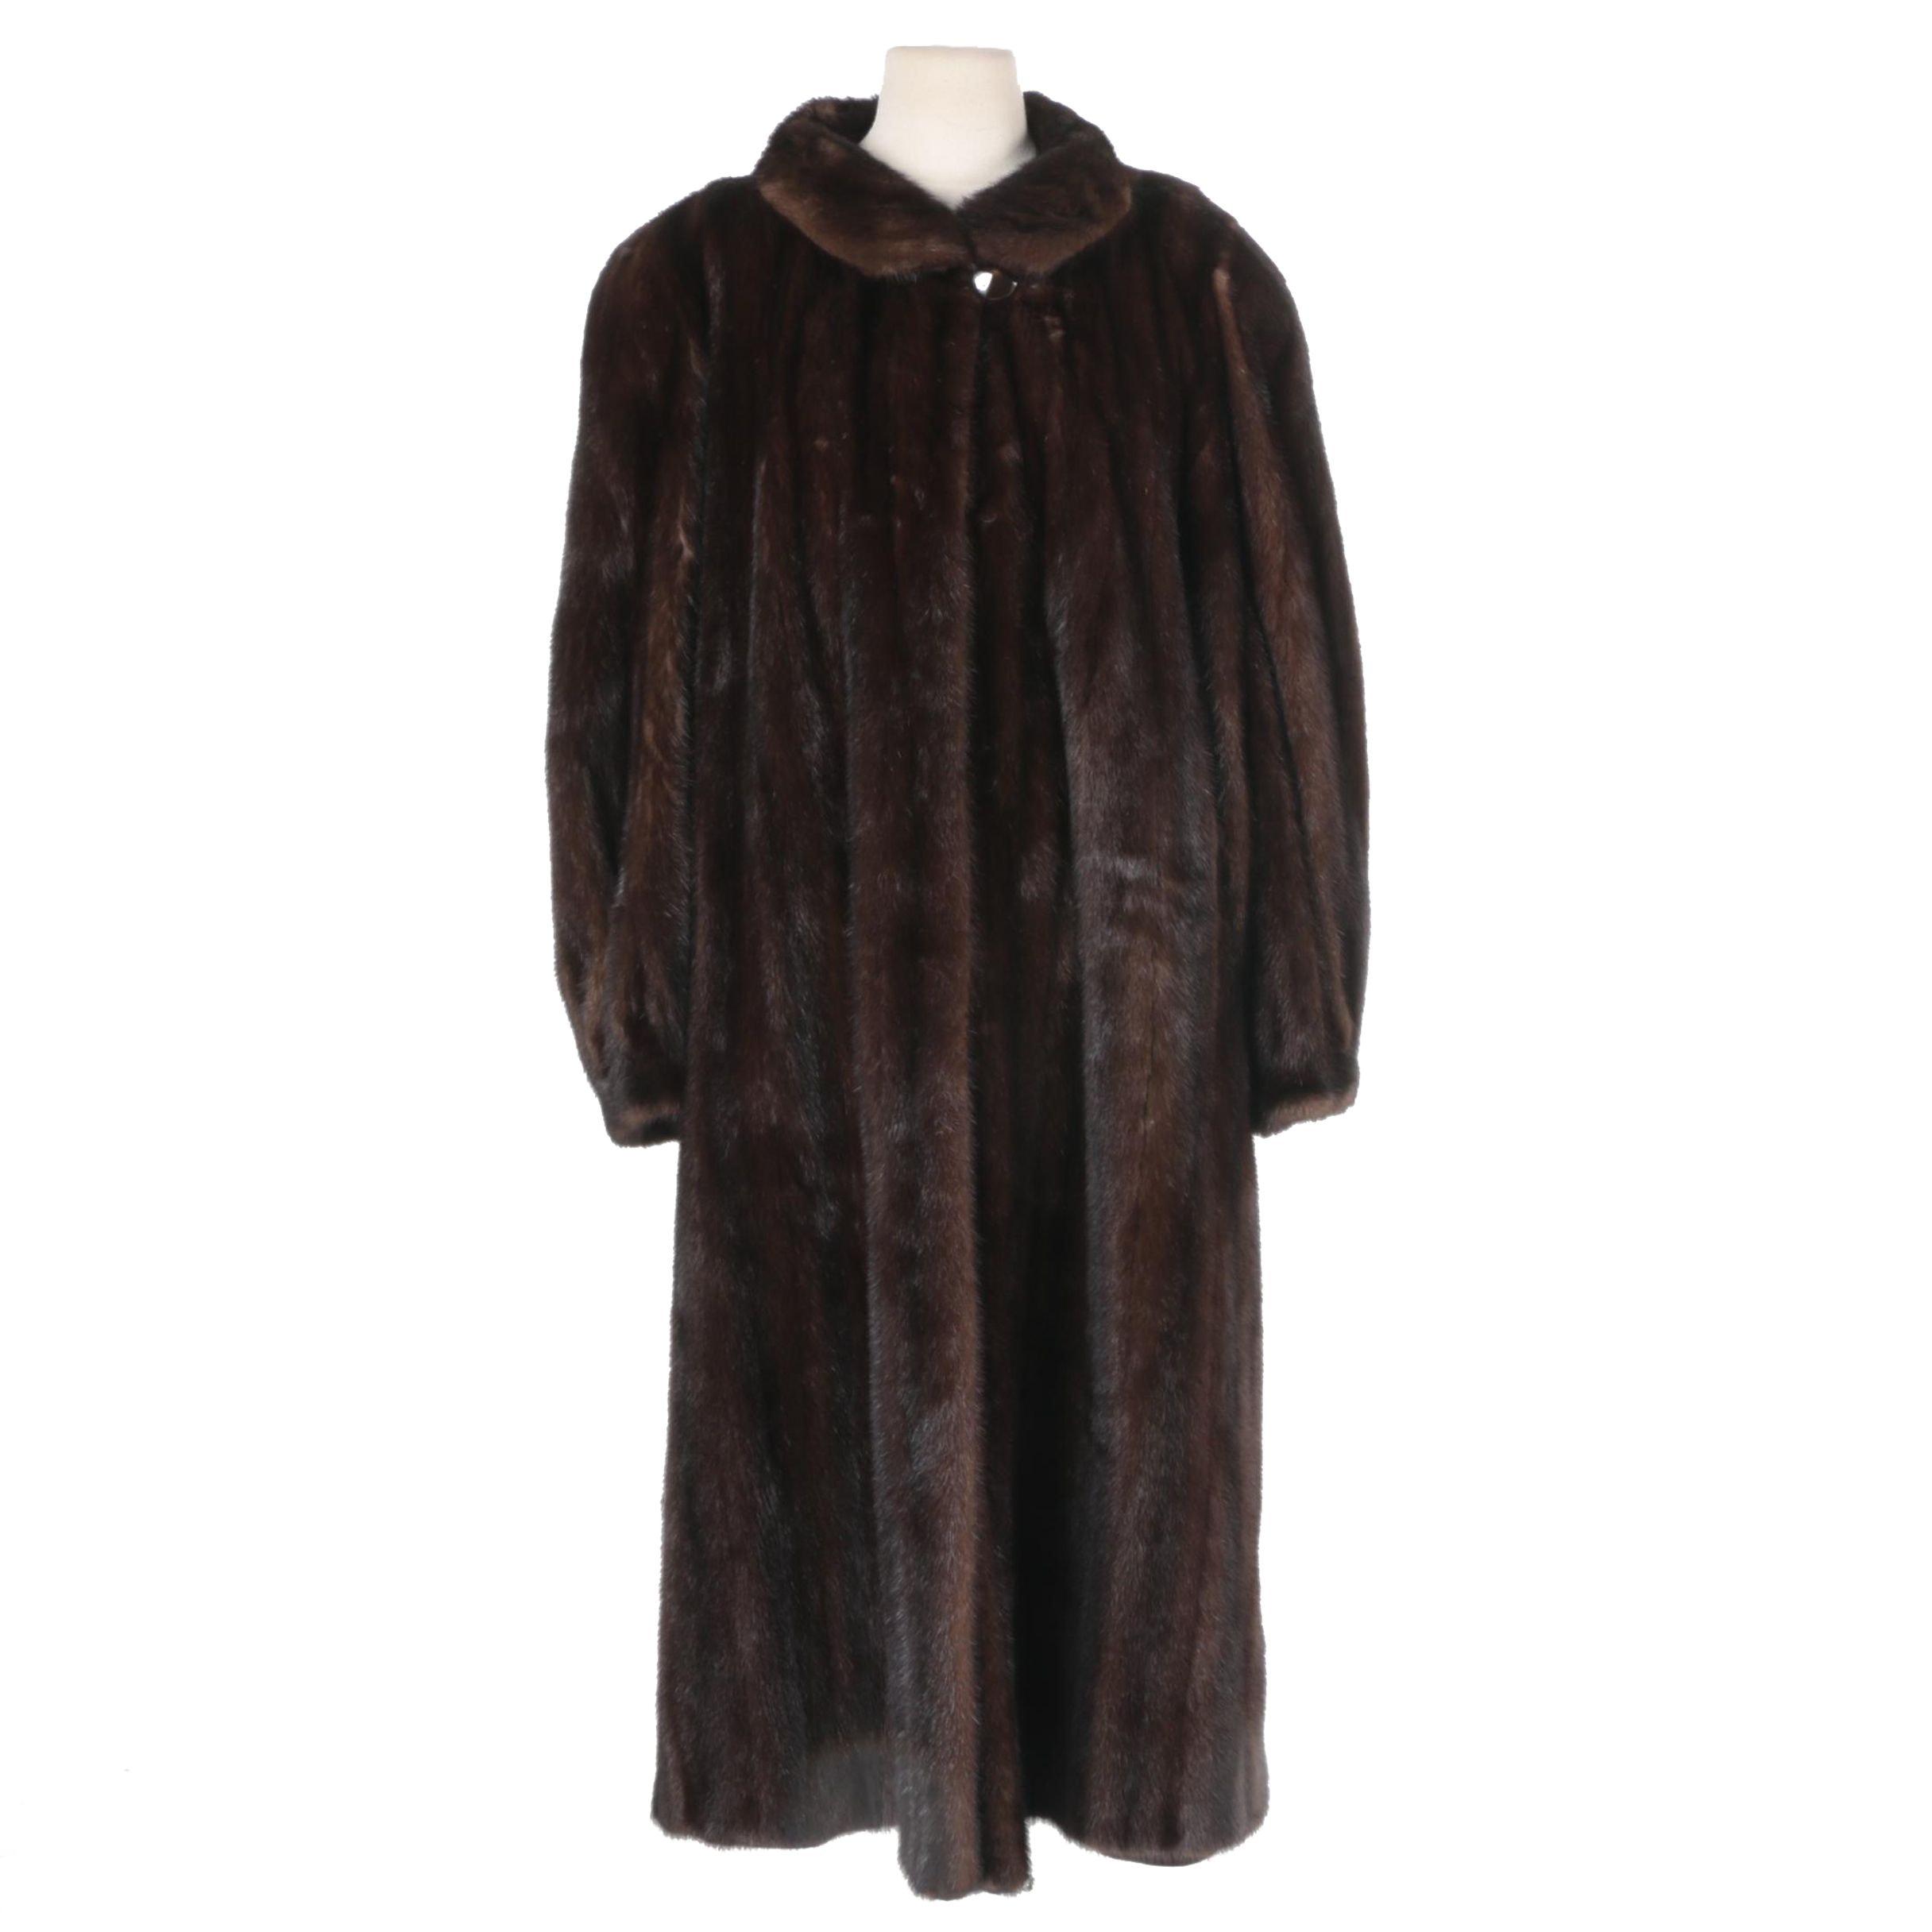 Vintage Pierre Balmain Mink Coat